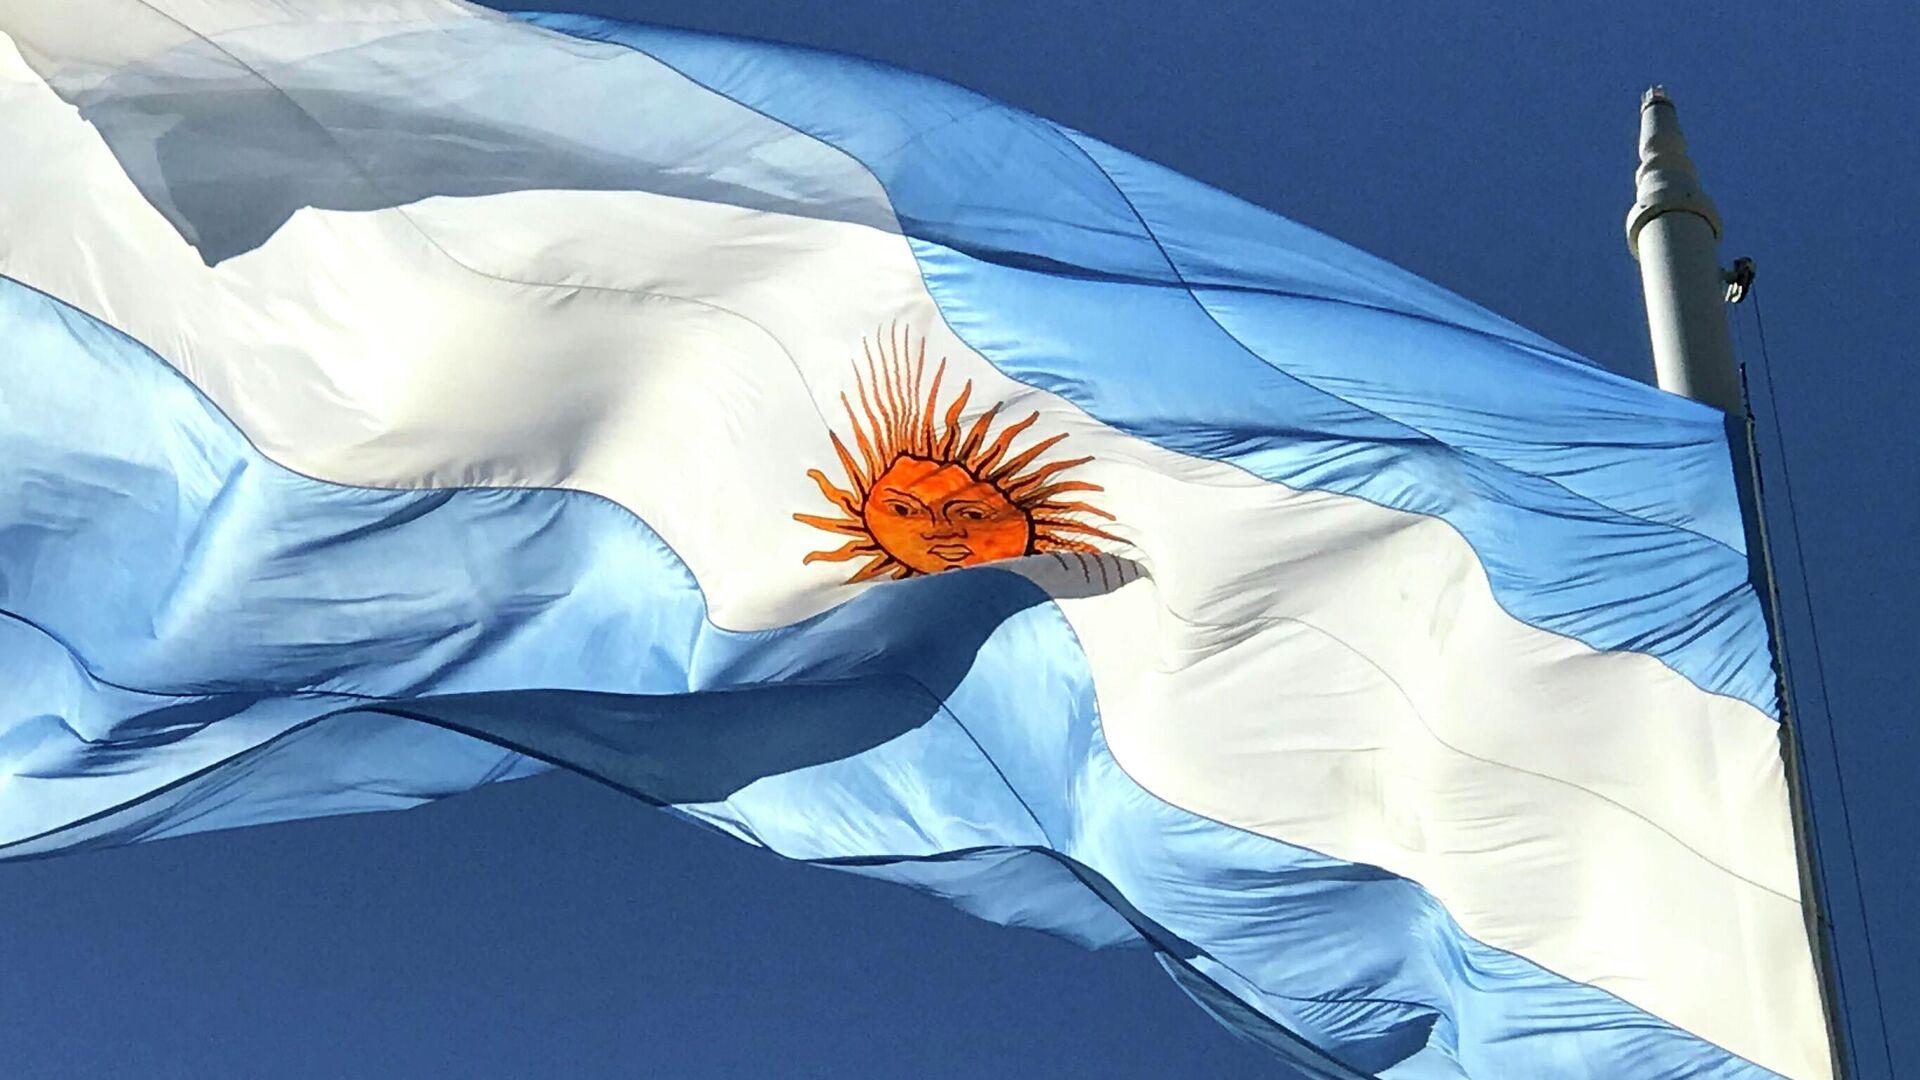 Bandera de Argentina - Sputnik Mundo, 1920, 06.09.2021